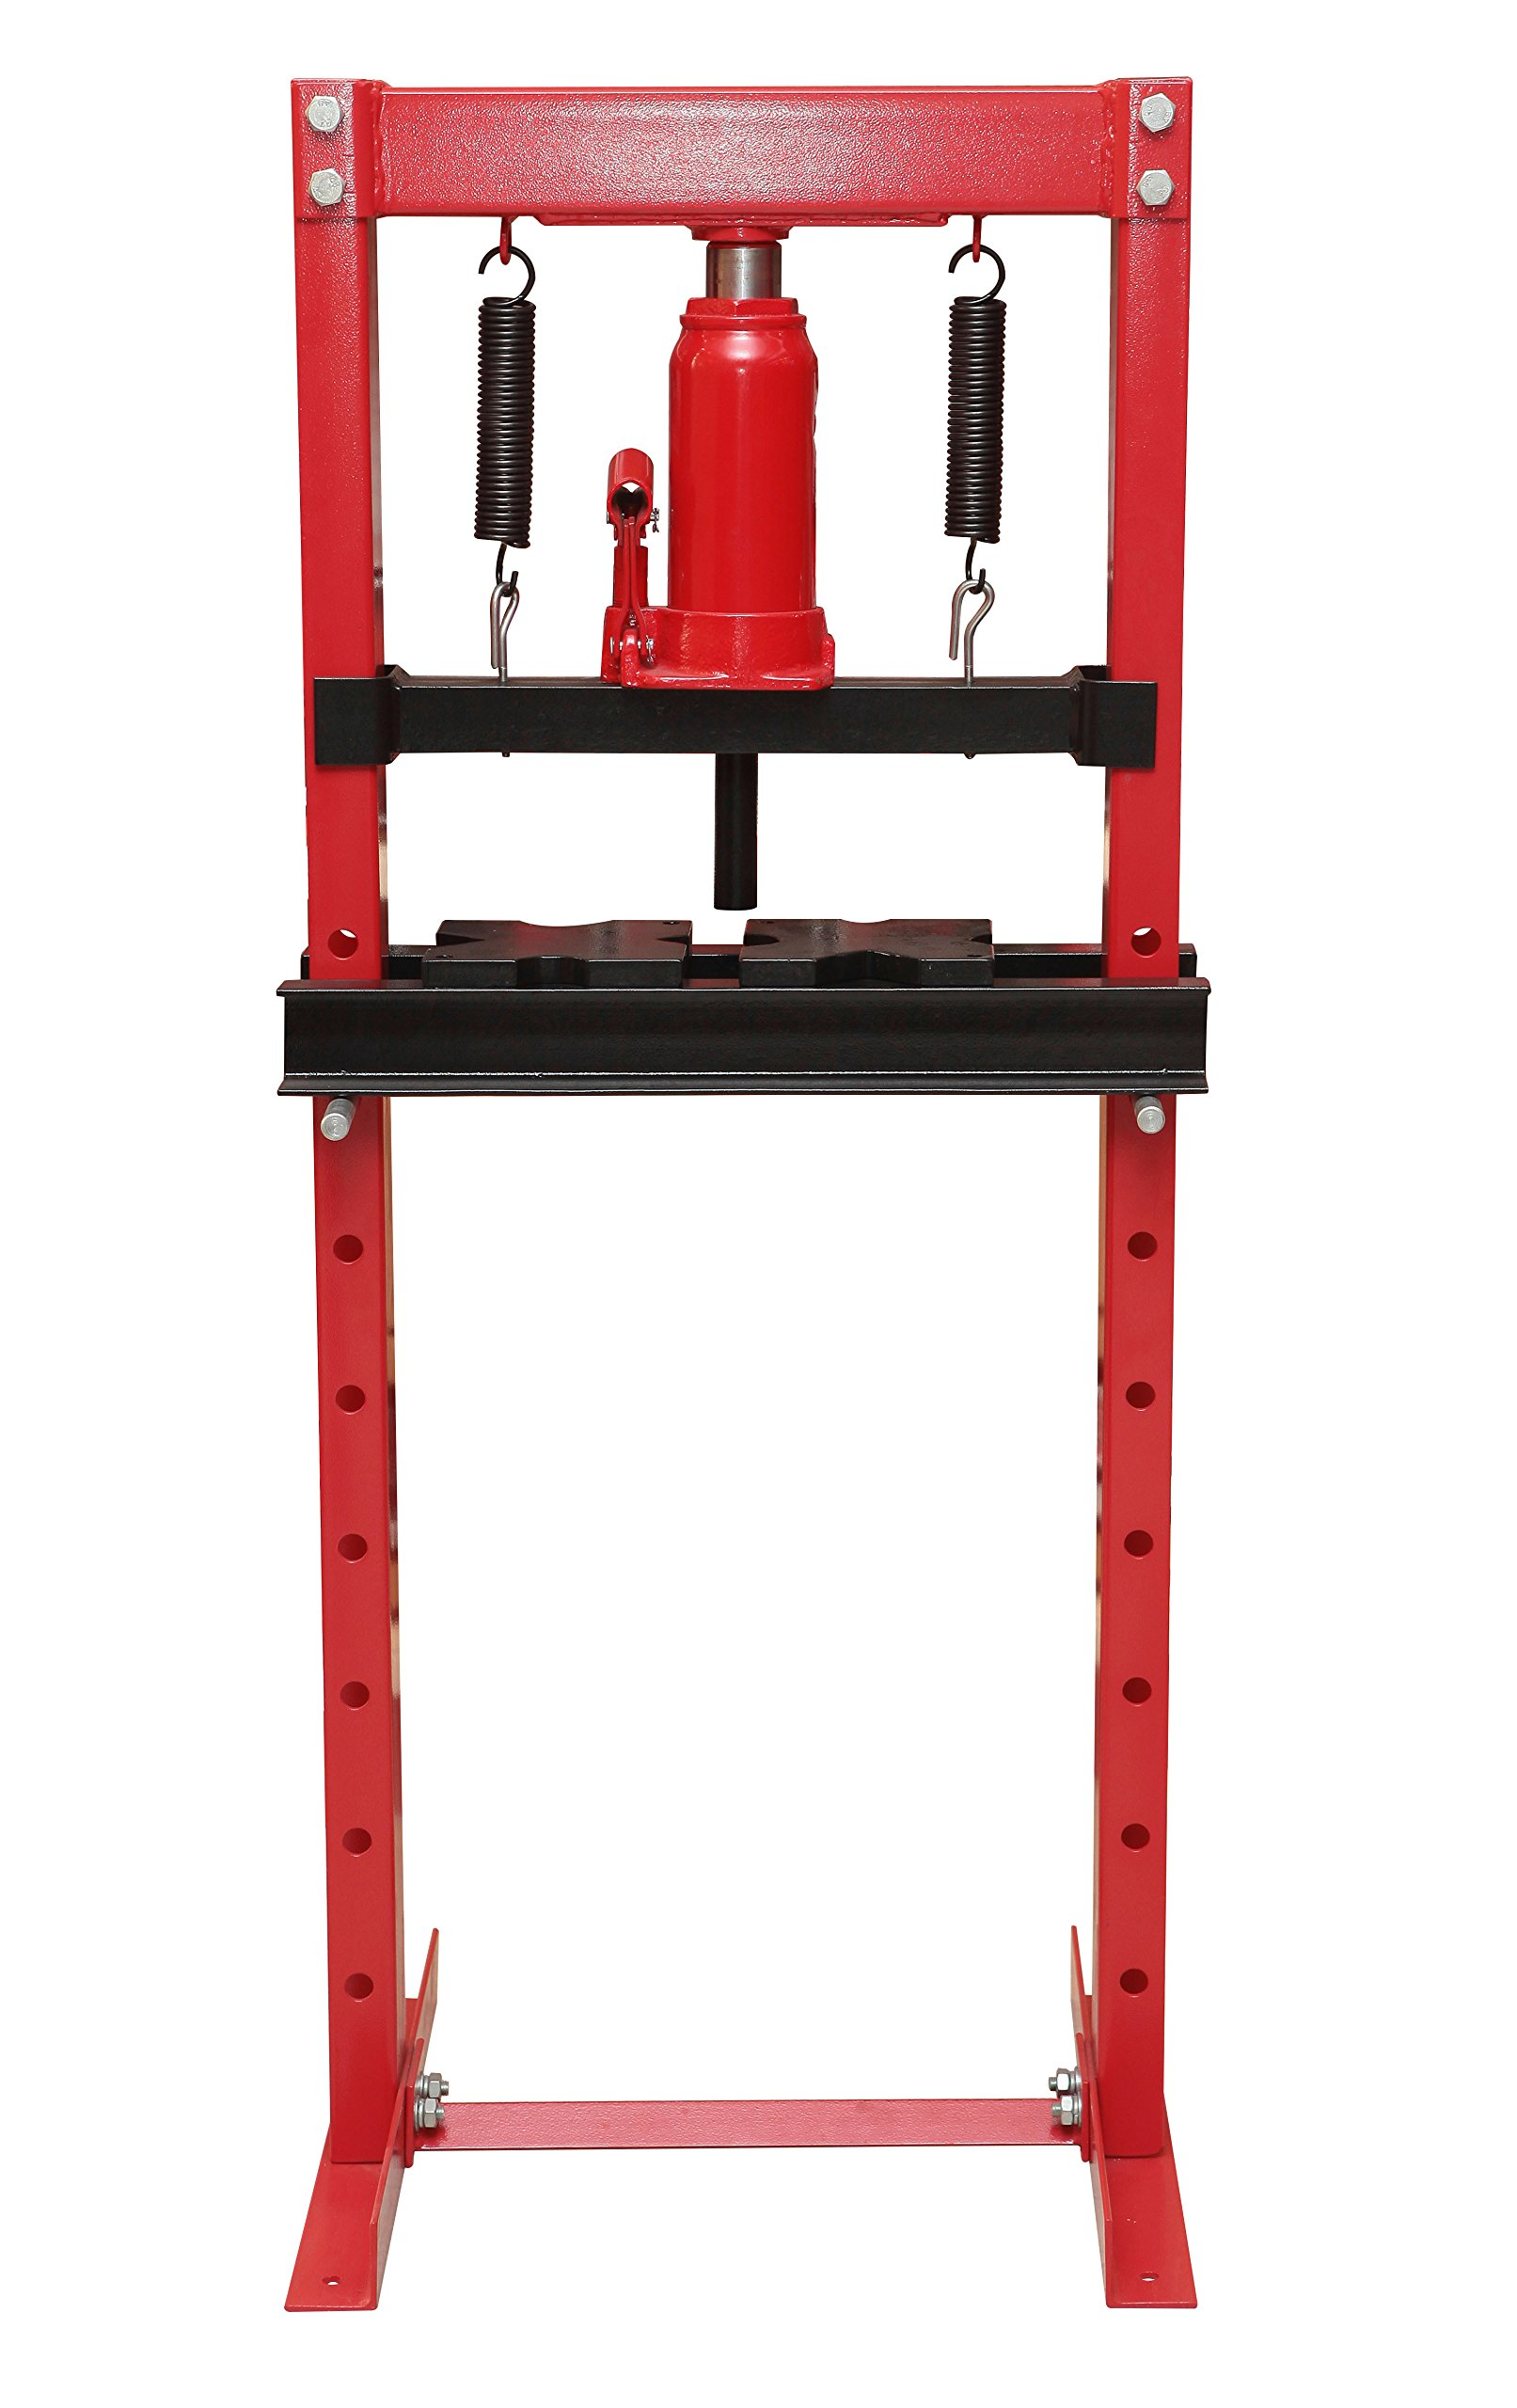 Torin Big Red T51201 Steel Frame Hydraulic Shop Press, 12 Ton Capacity